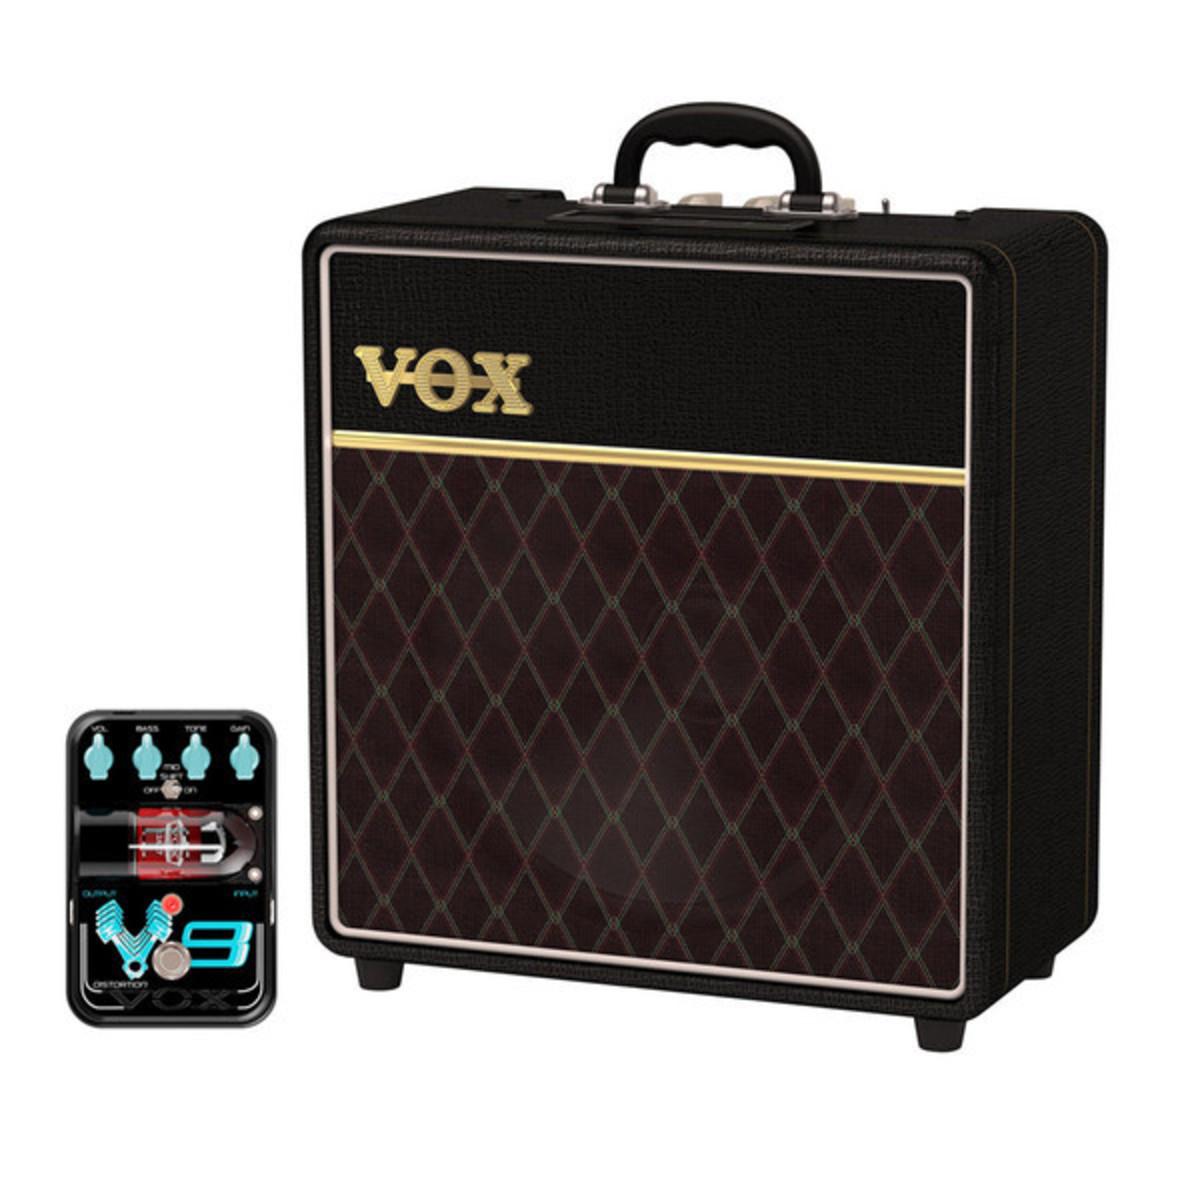 vox ac4c1 12 custom series guitar amplifier w free distortion pedal at. Black Bedroom Furniture Sets. Home Design Ideas